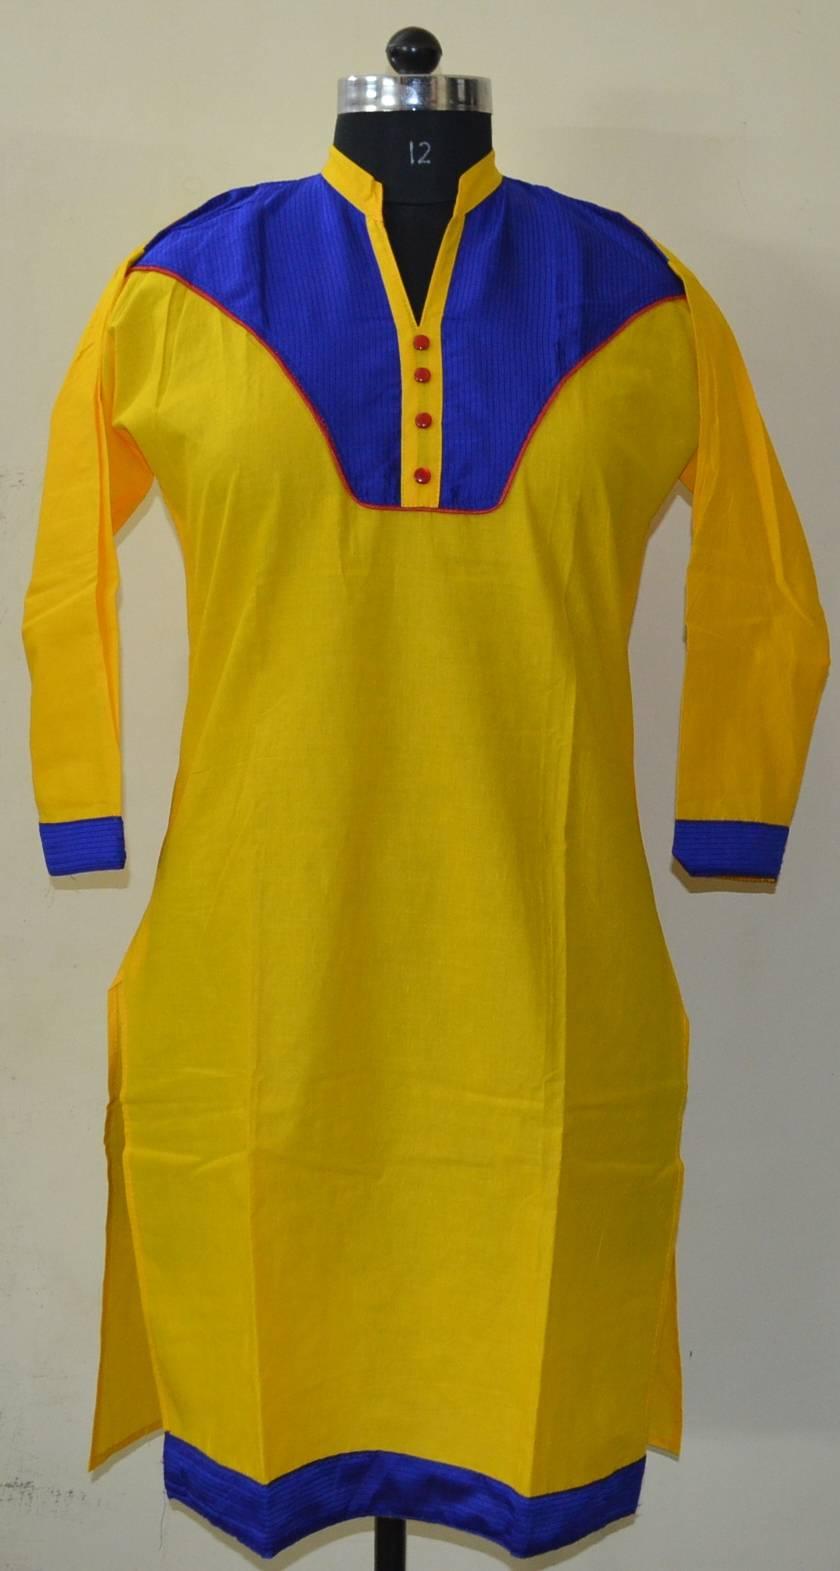 Ethnic-Indian-designer-Cotton-Printed-Kurta-Top-Top Tunic Bust 36-40 Design